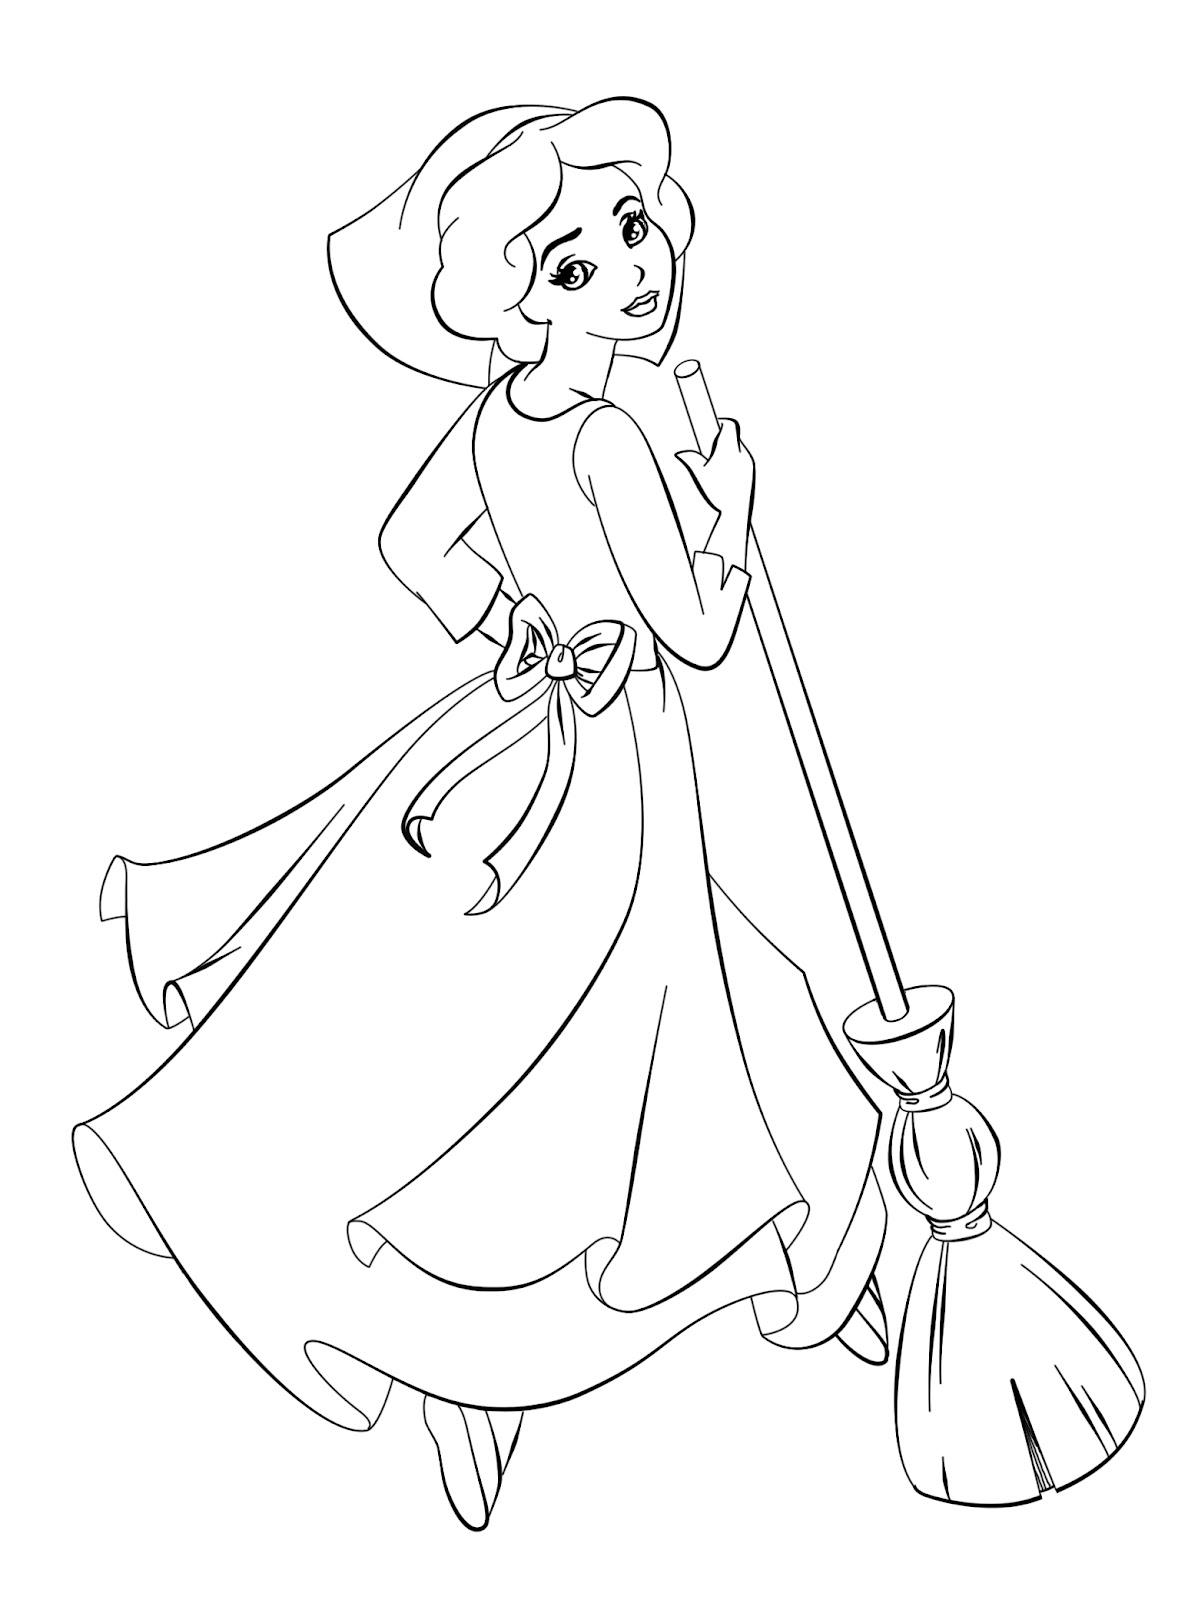 Paola Tosca Art Disney Crossover Linearts